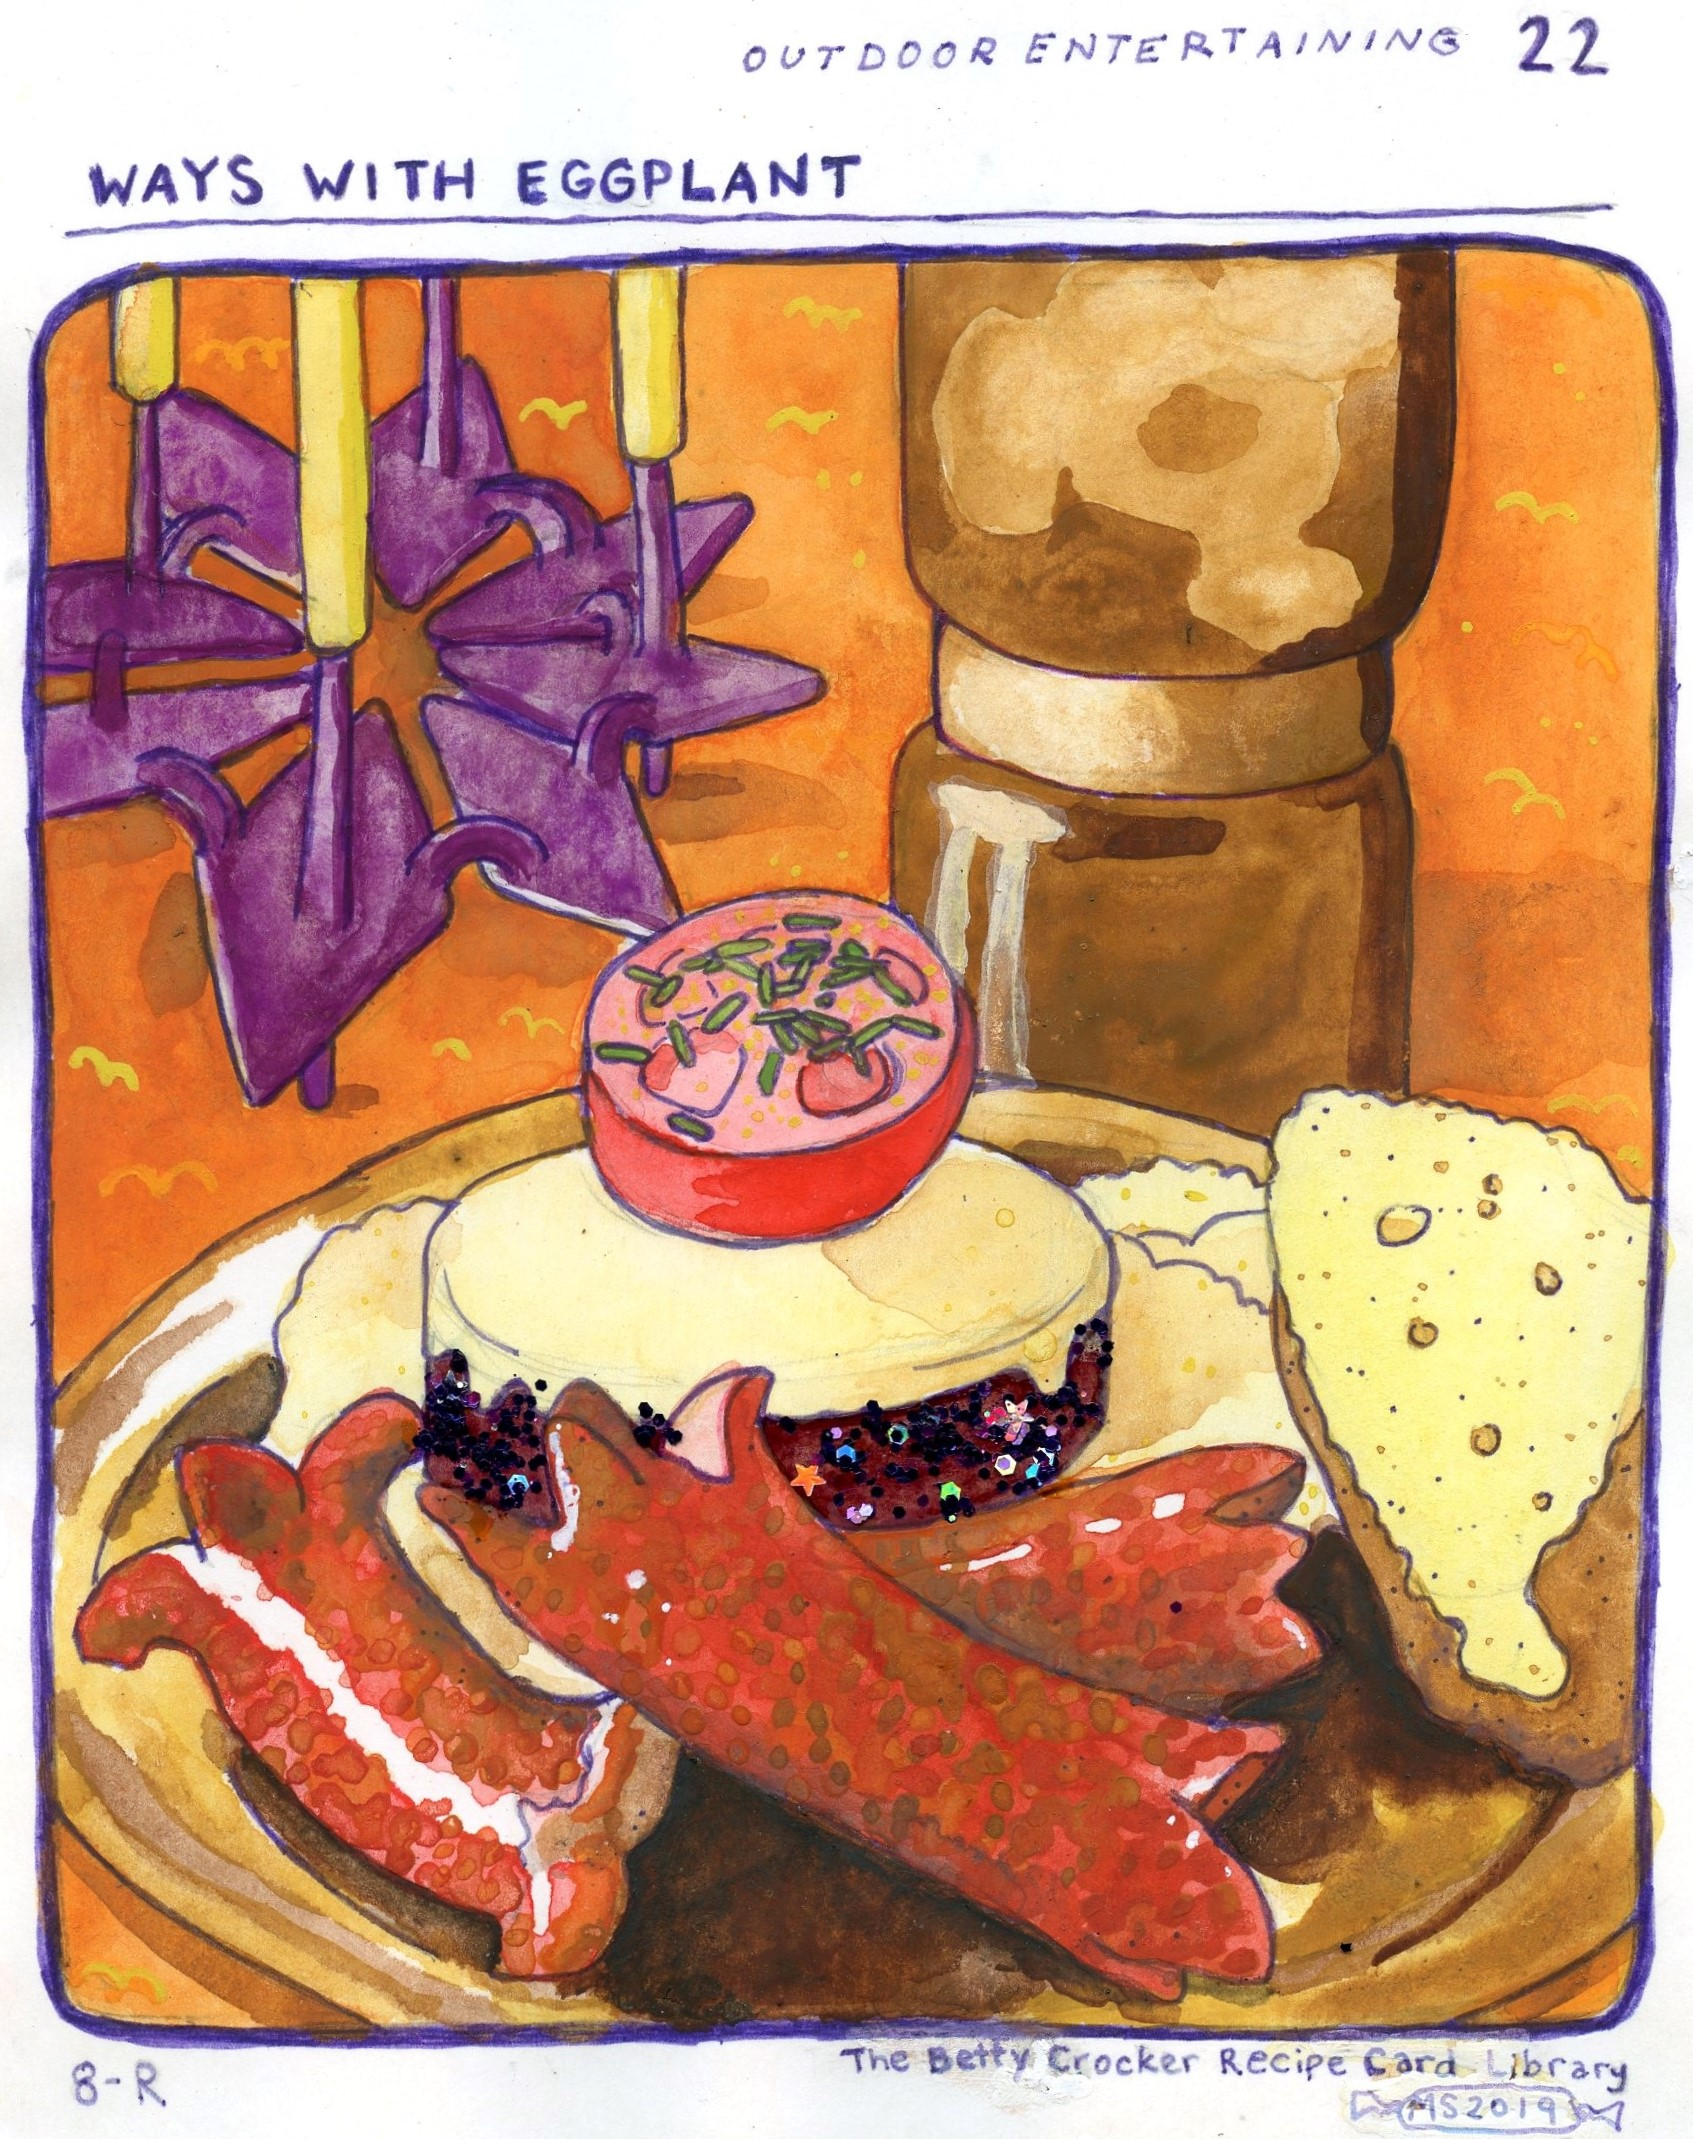 Ways with Eggplant